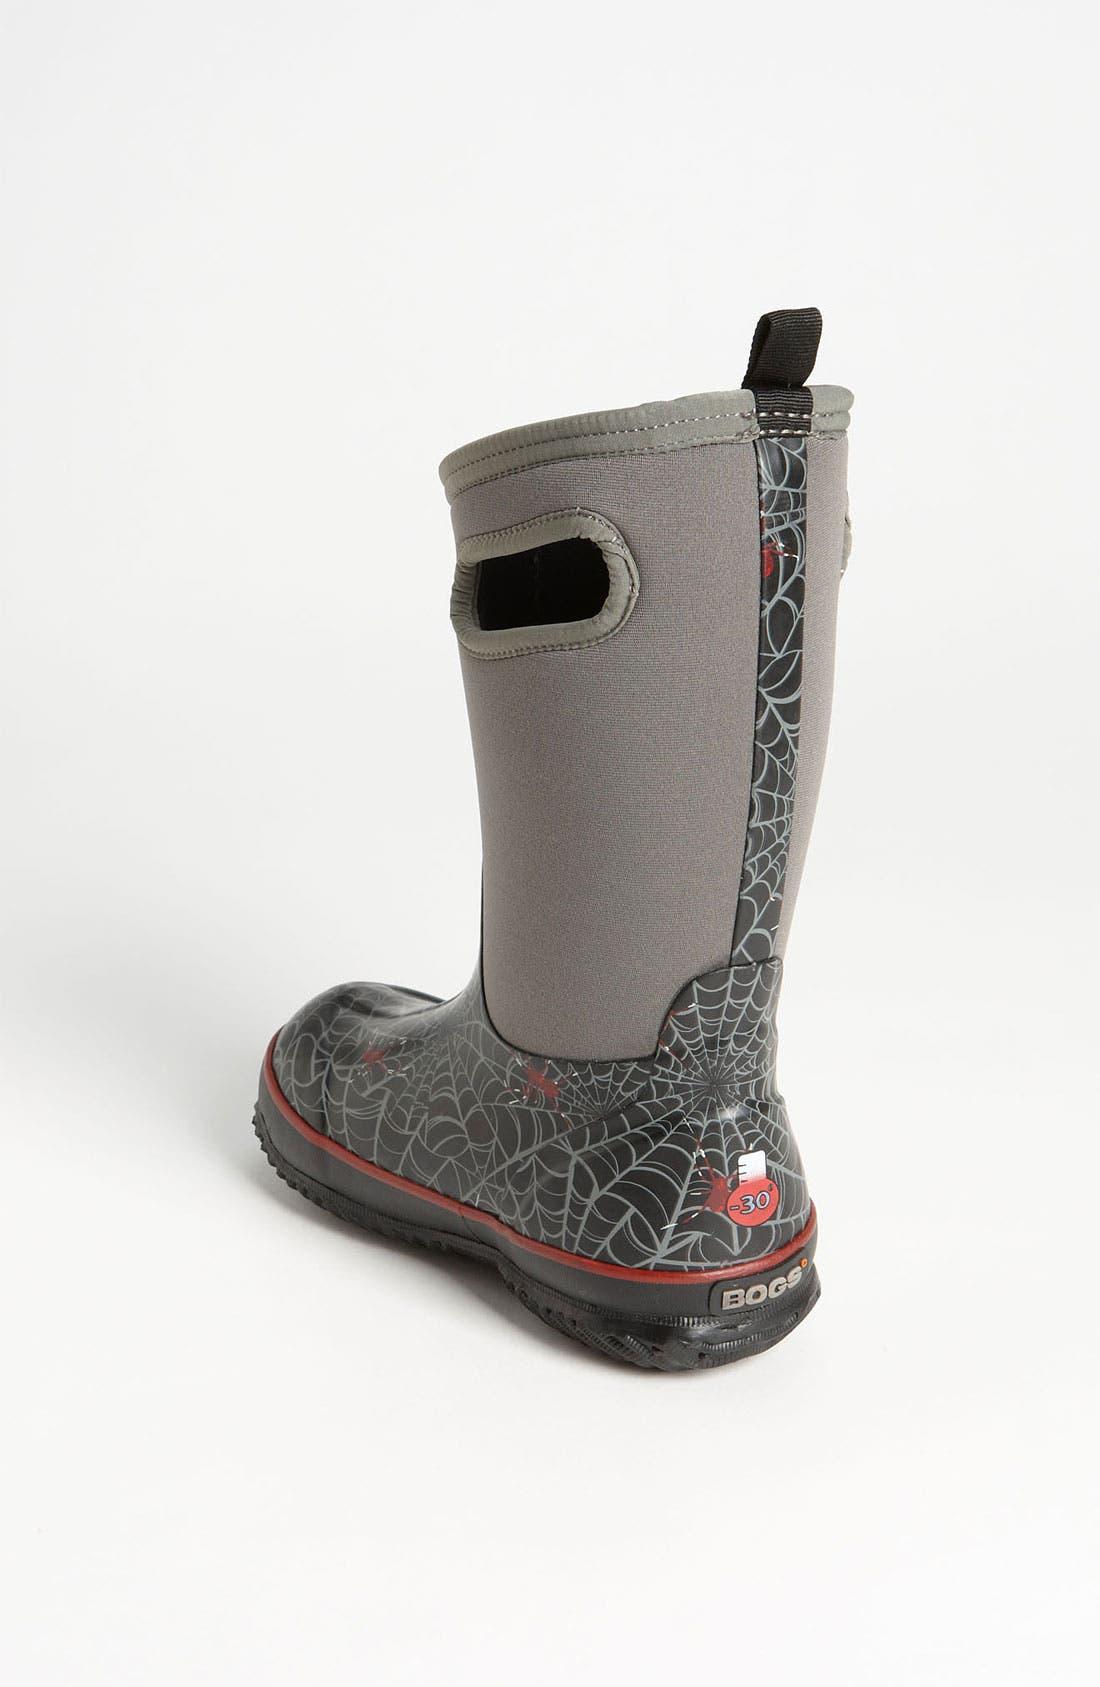 Alternate Image 2  - Bogs 'Classic High - Spiders' Waterproof Boot (Toddler, Little Kid, & Big Kid)